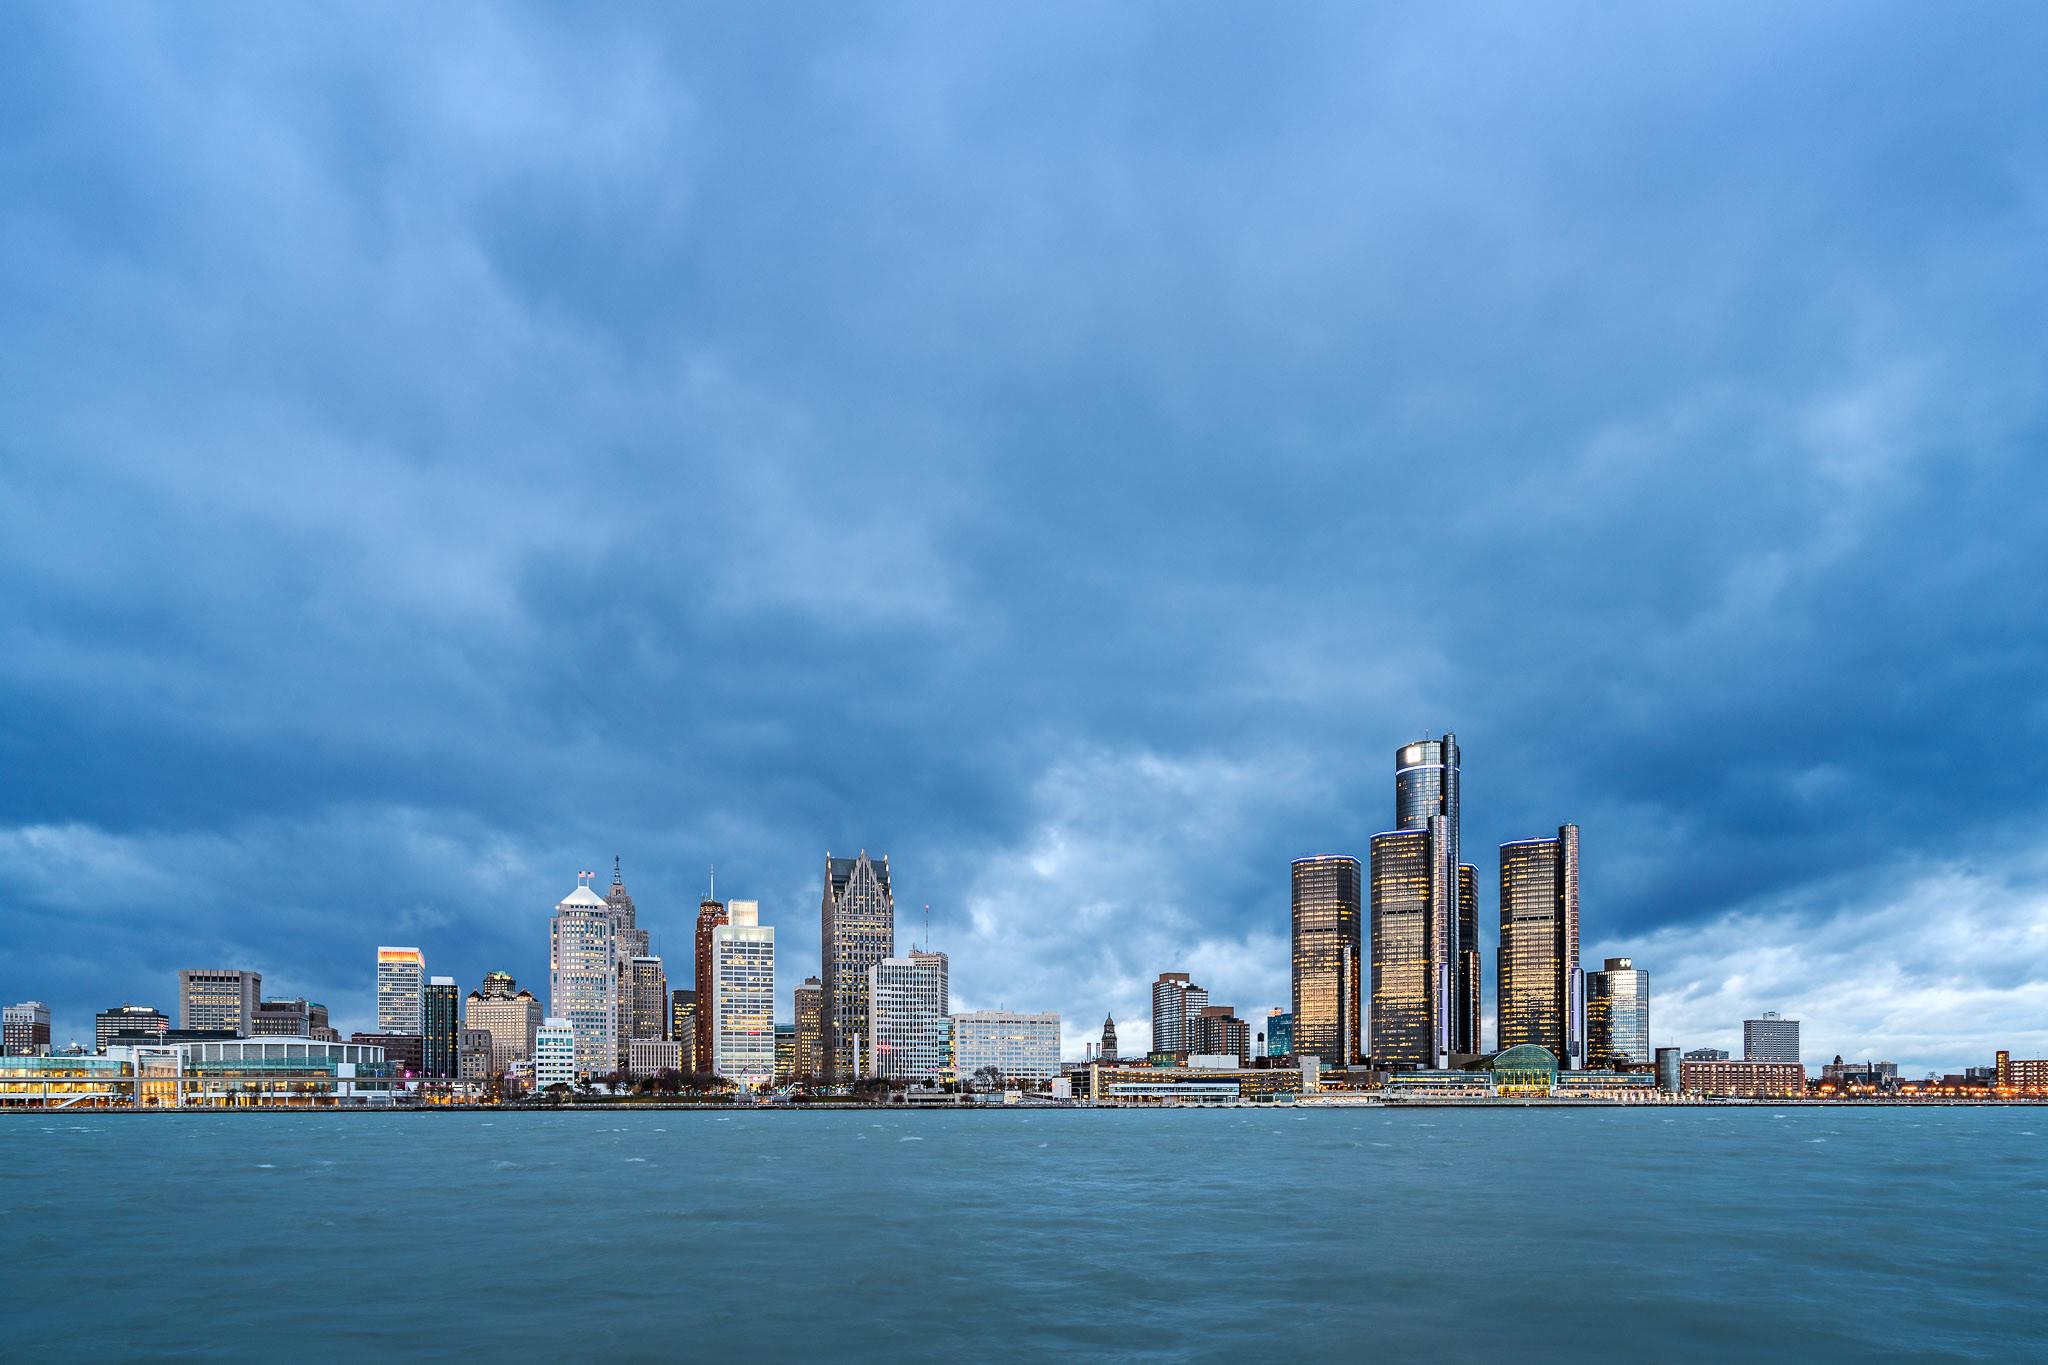 1920x1080 Chicago Skyline Backgrounds Wallpaper 1920×1080 Chicago Skyline Wallpapers (48 Wallpapers) | Adorable